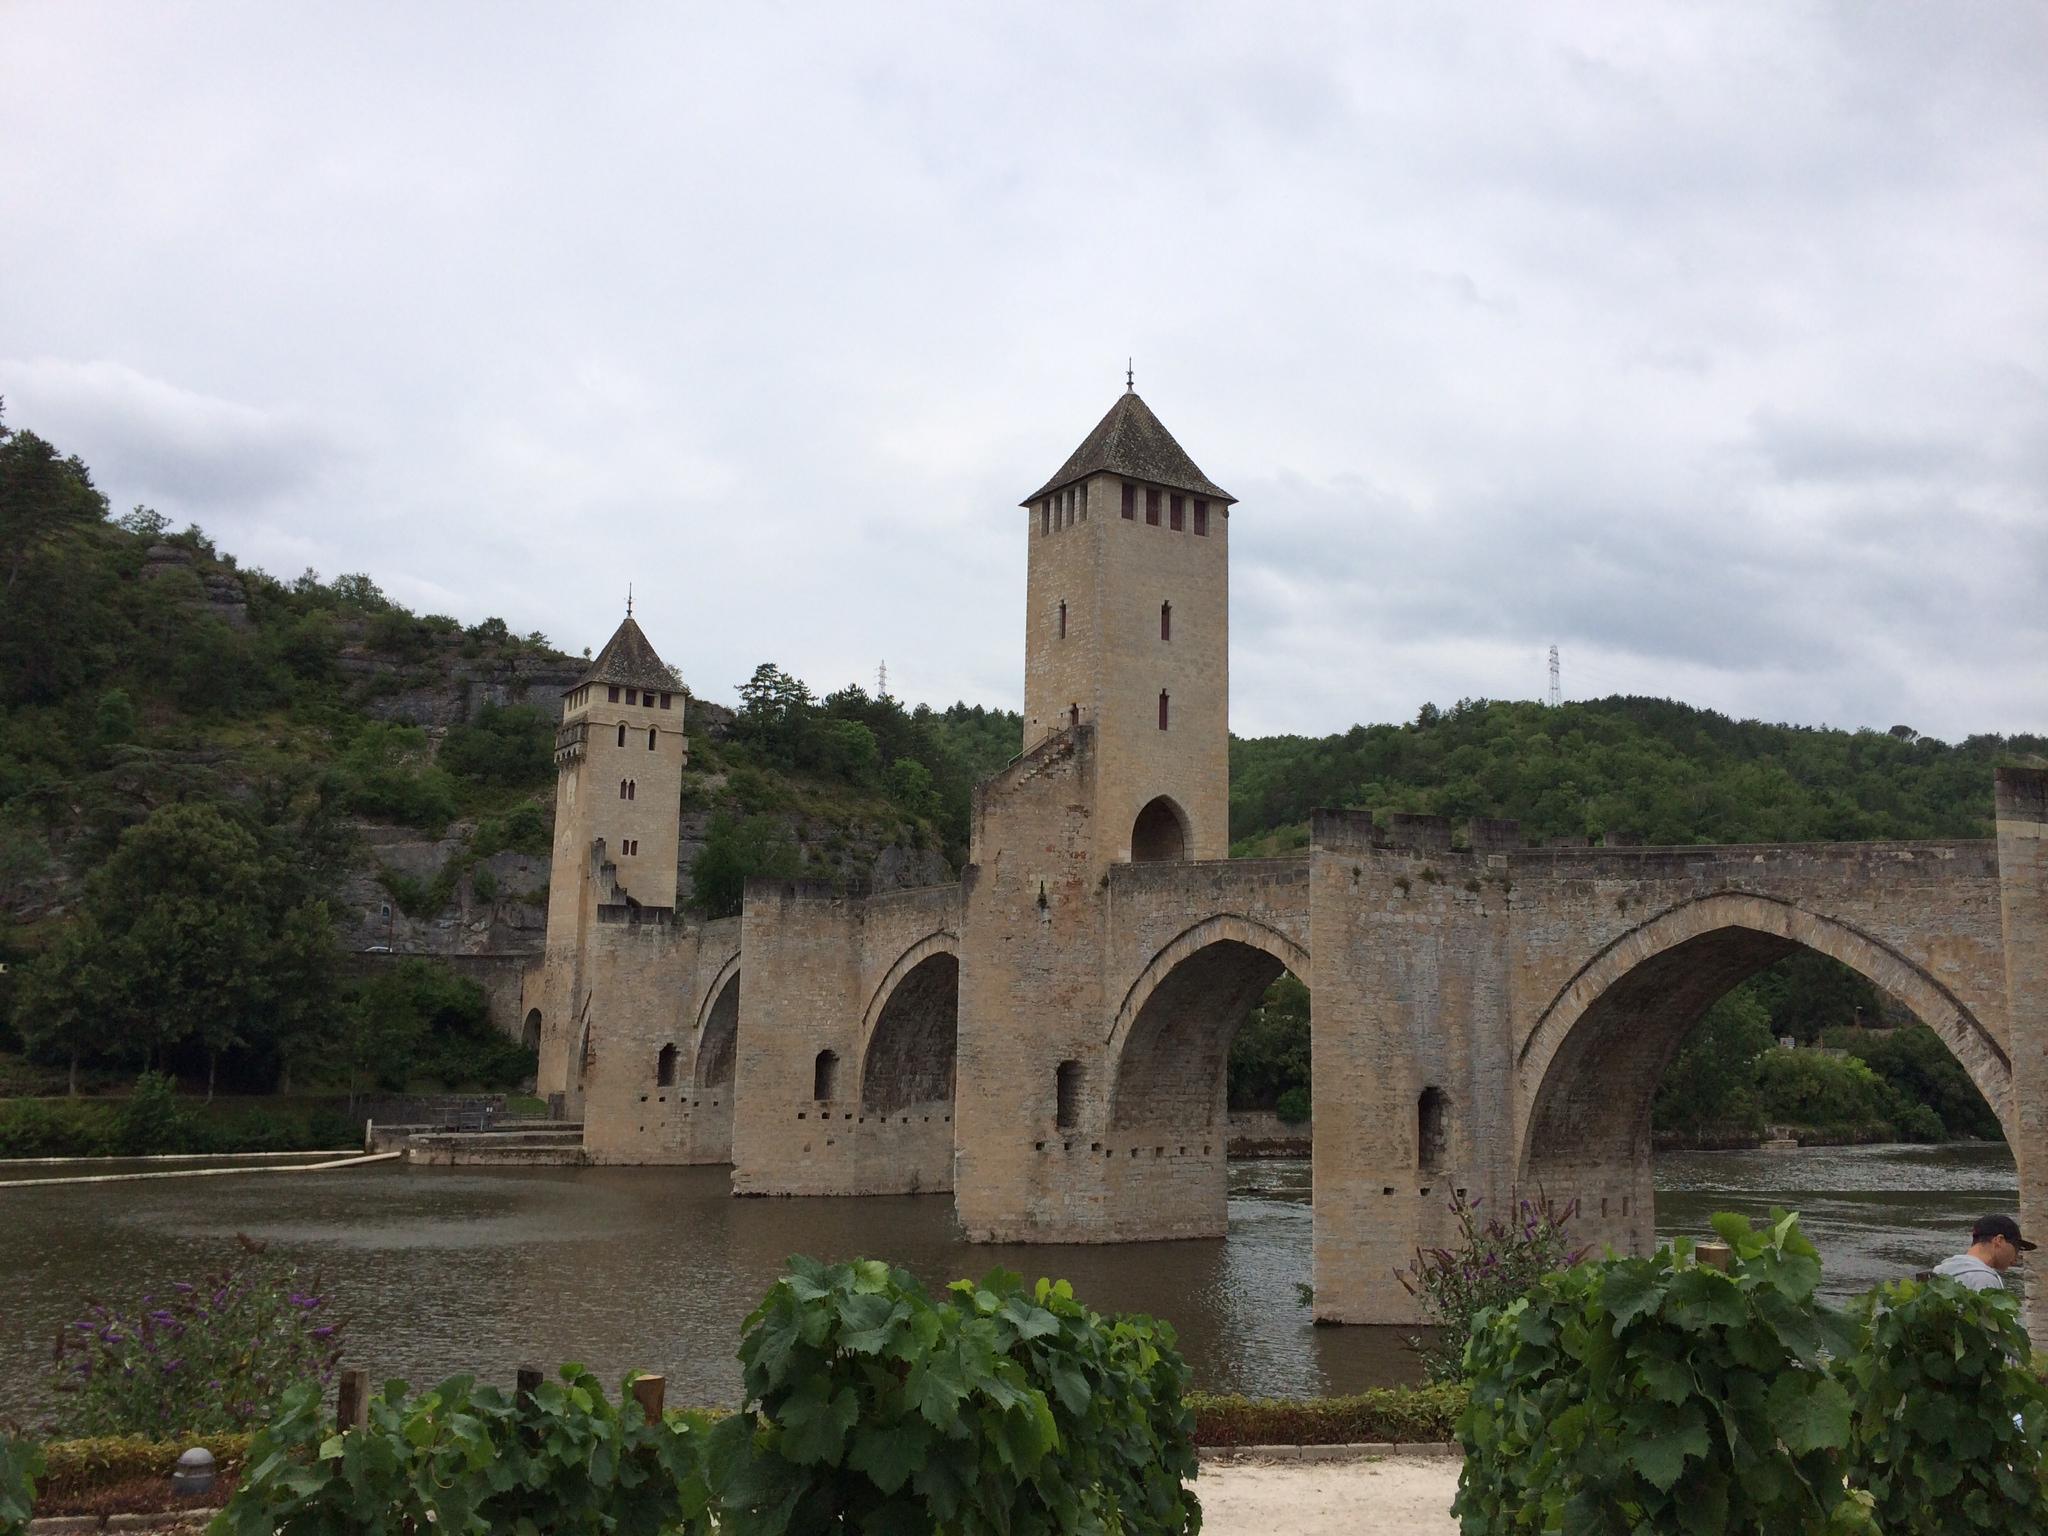 This bridge, the Valentre Bridge, is from the 14th century.